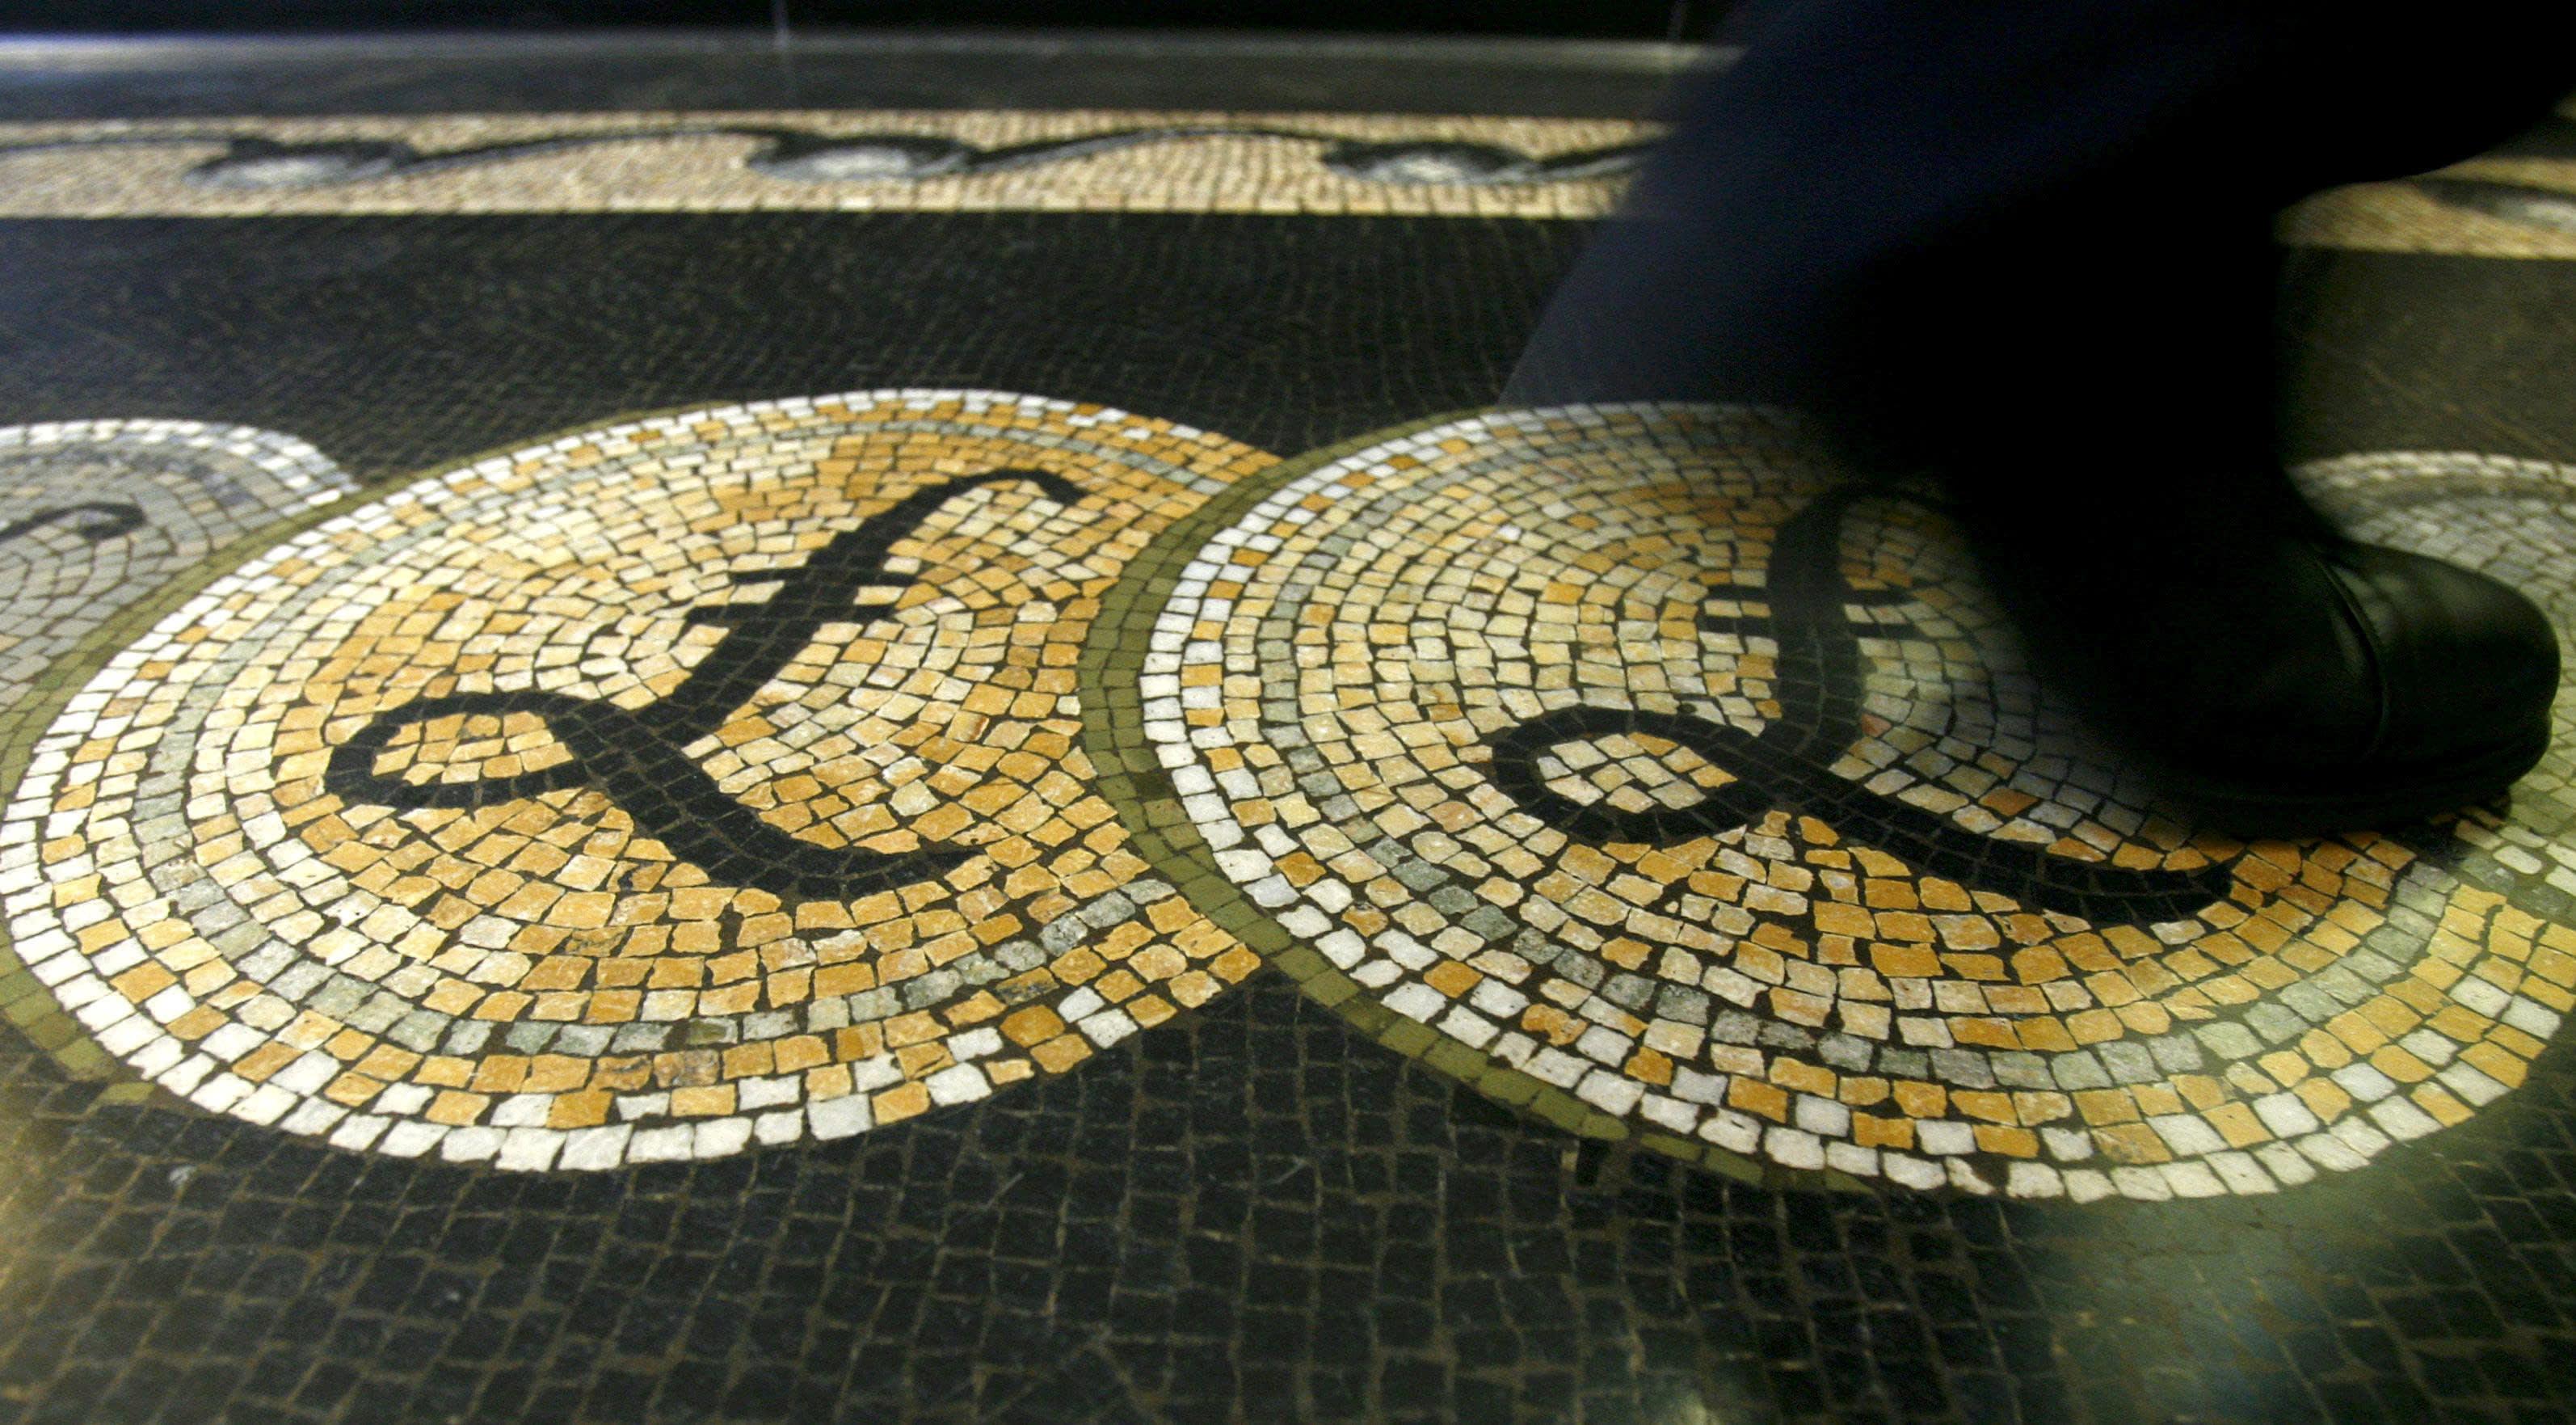 Tavistock shuns £15m takeover attempt